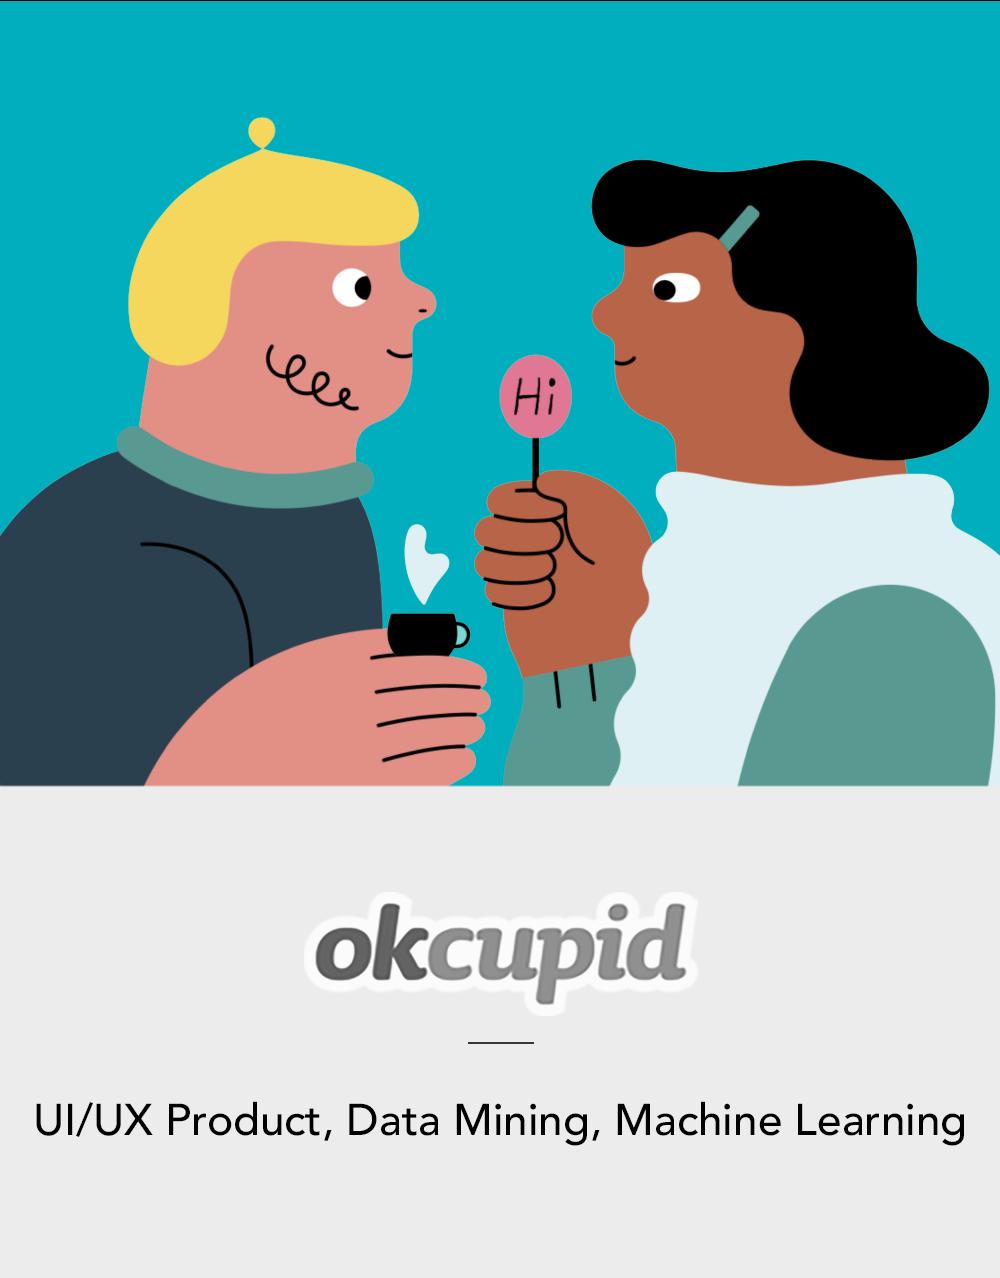 OkCupid.png